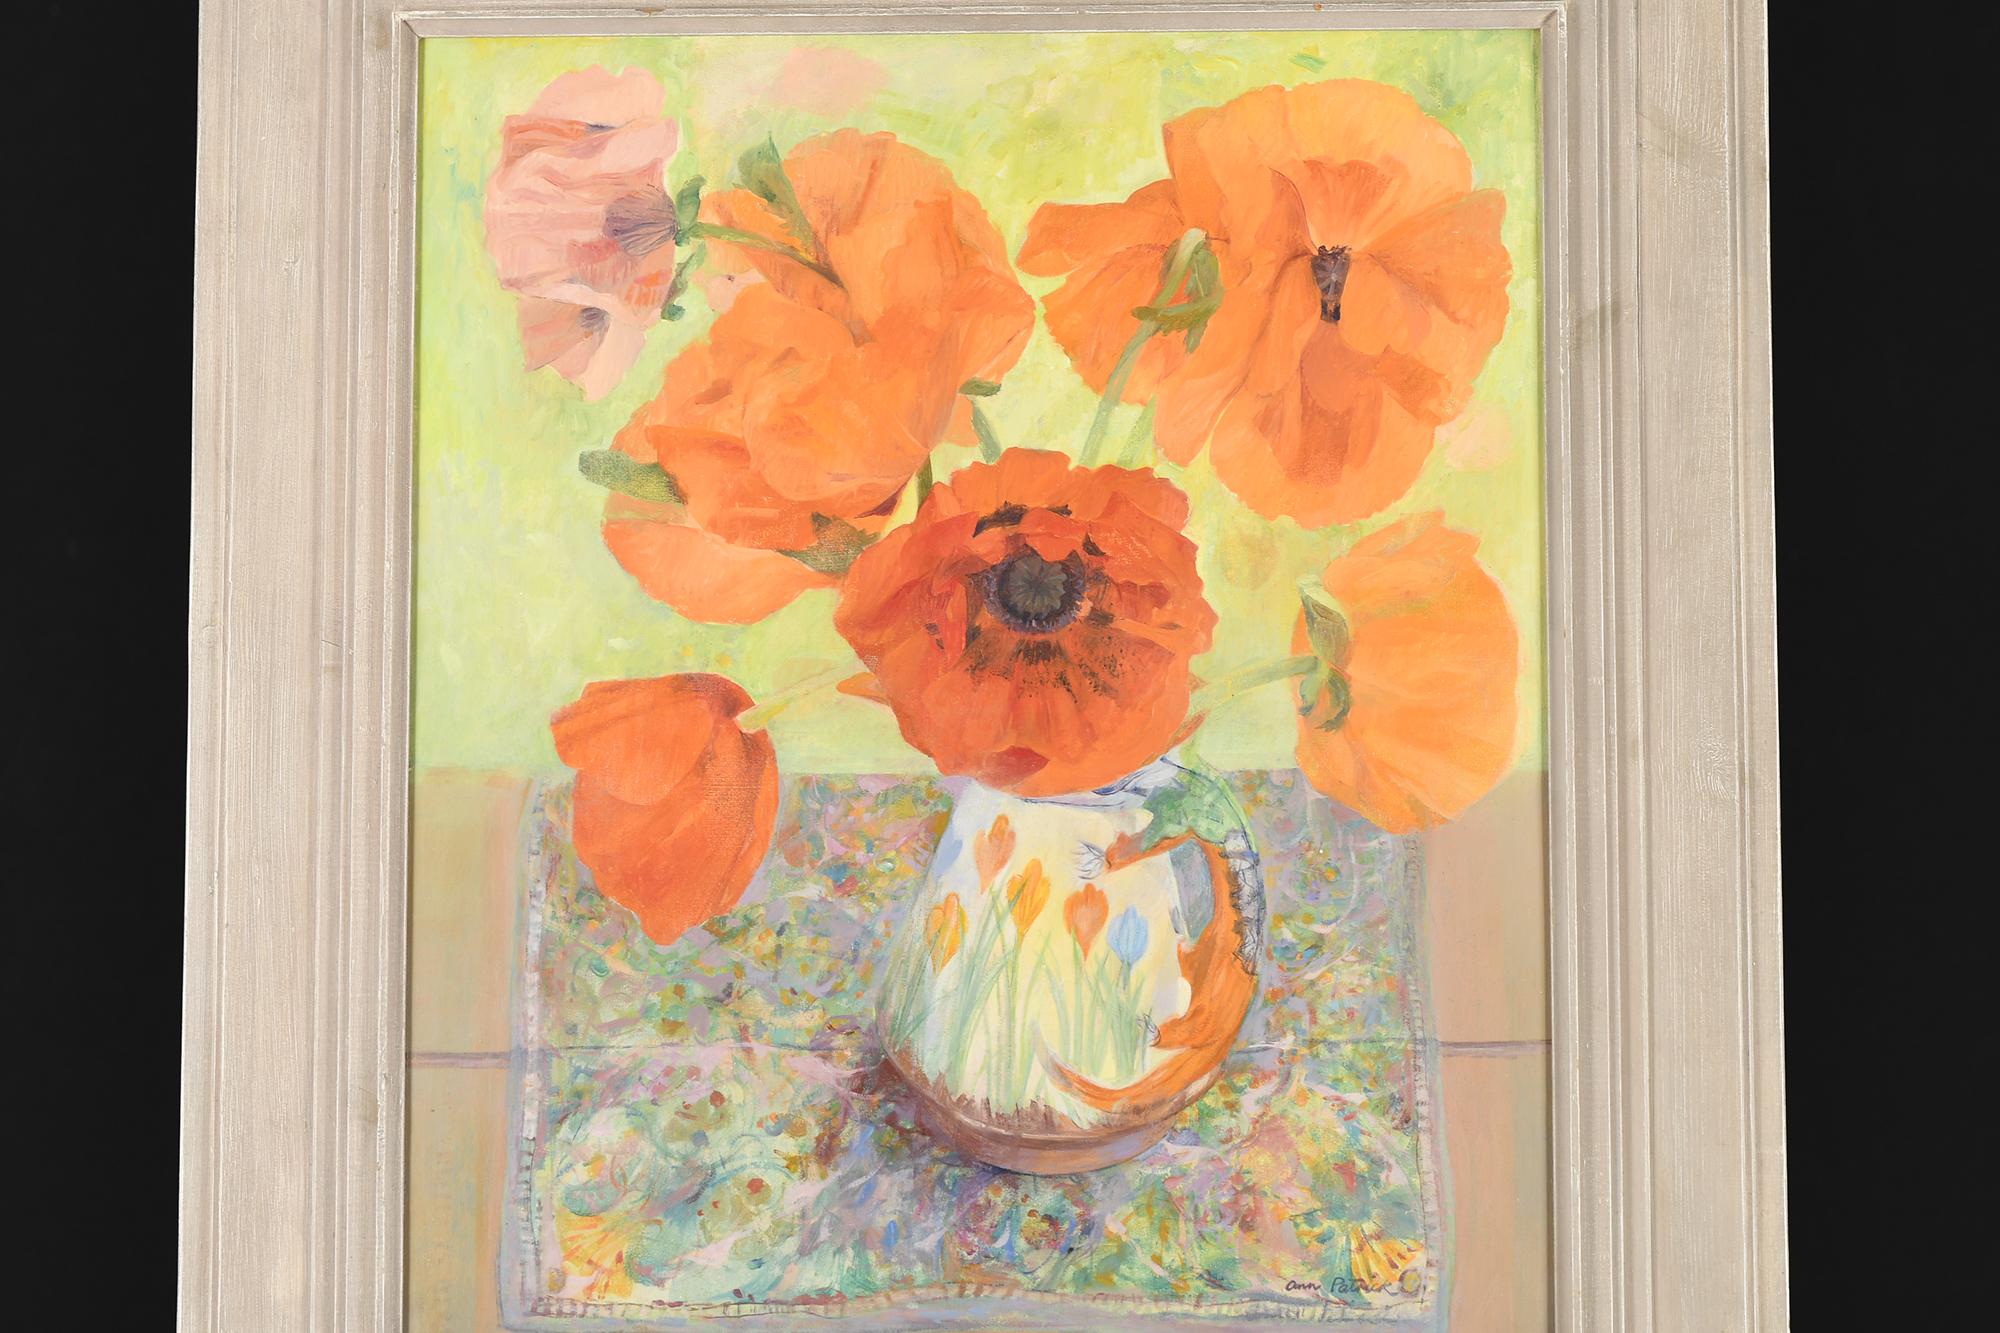 Original Oil Painting by Scottish Artist Ann Patrick. - Image 2 of 9